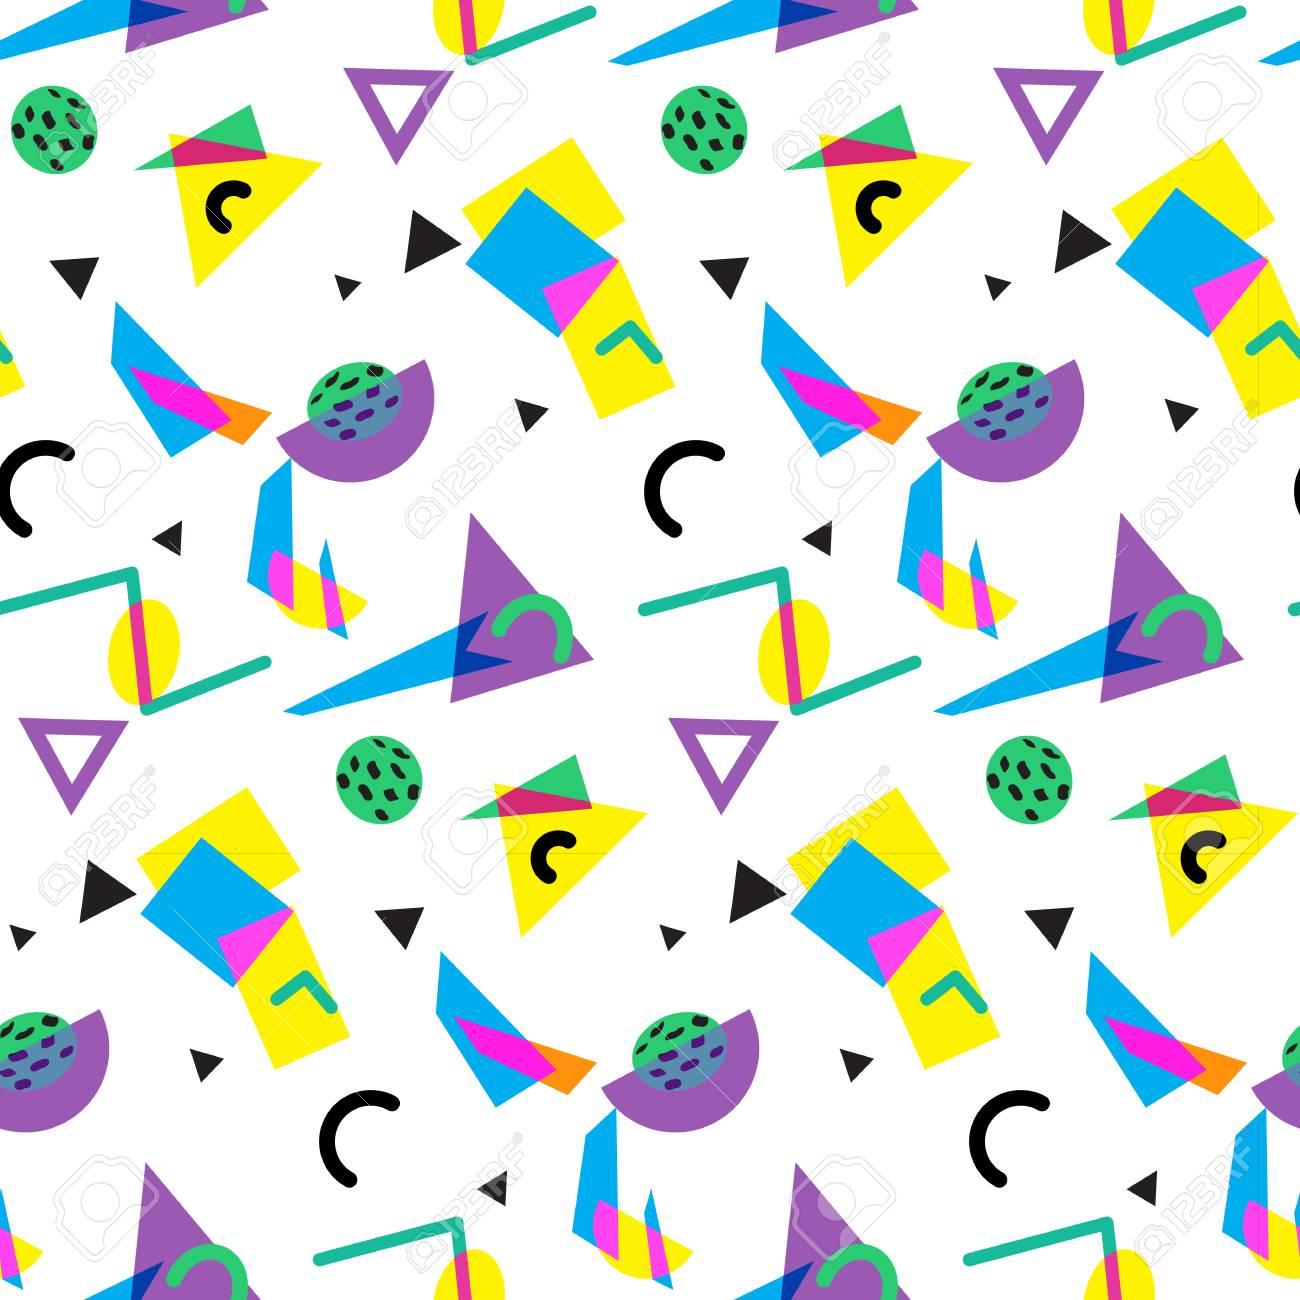 Seamless geometric pattern in retro 80s style, memphis